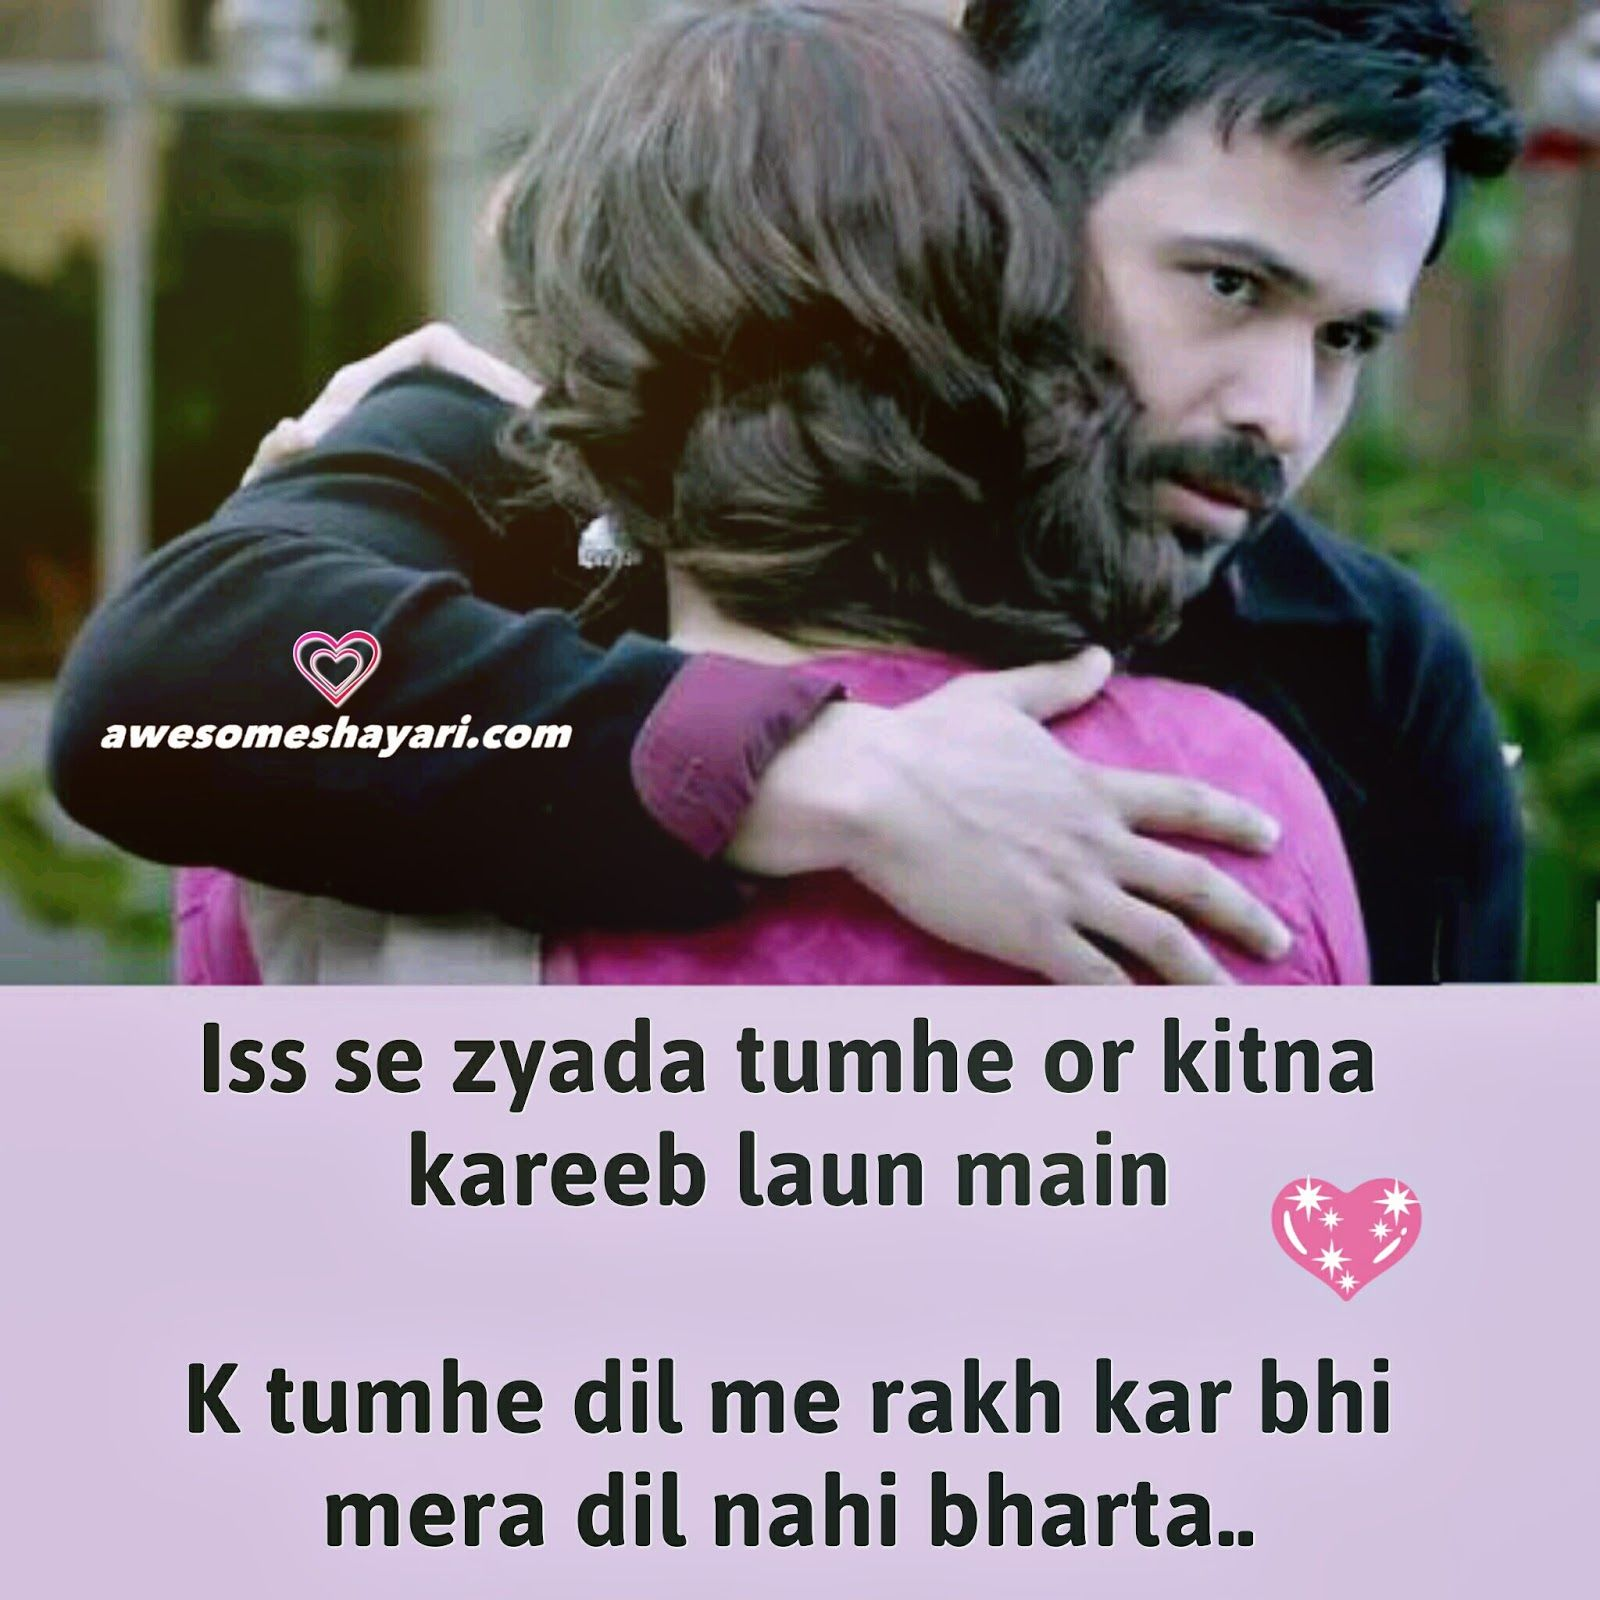 Latest Quotes In Hindi: Love Shayari, New Romantic Shayari,Quotes For Facebook